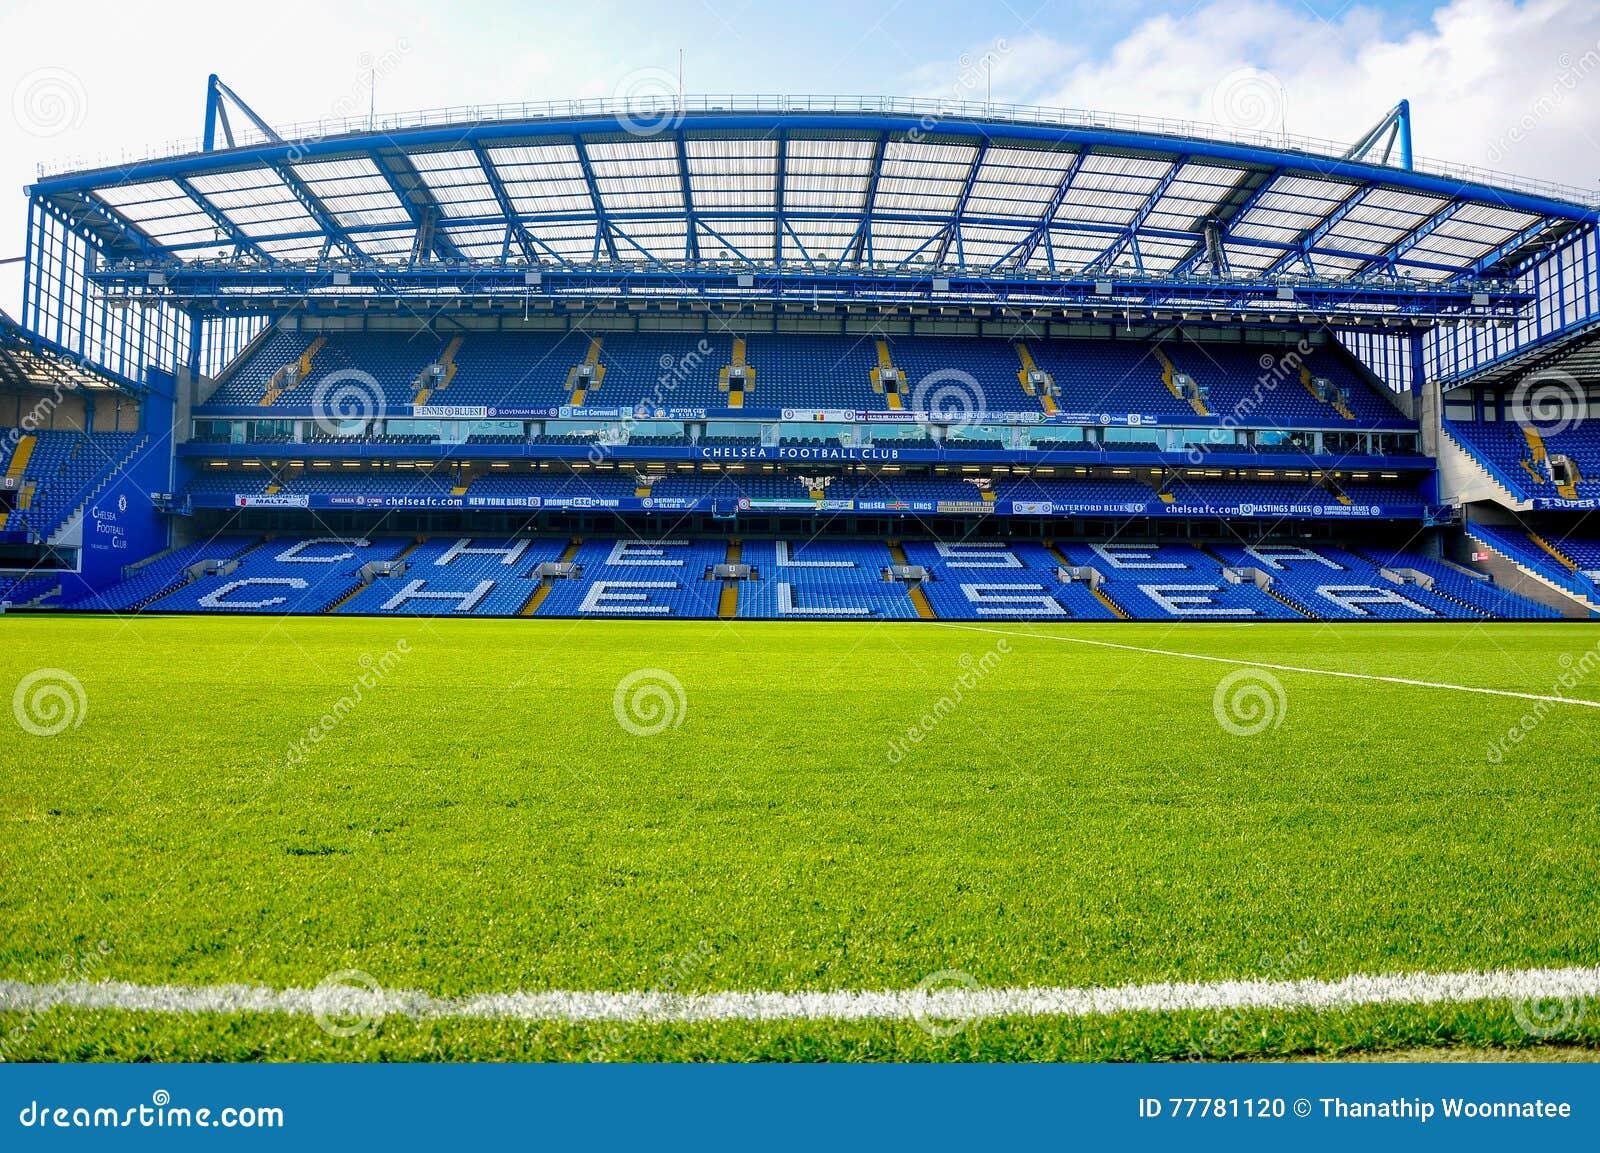 Stand of Stamford Bridge, home ground of Chelsea F.C.